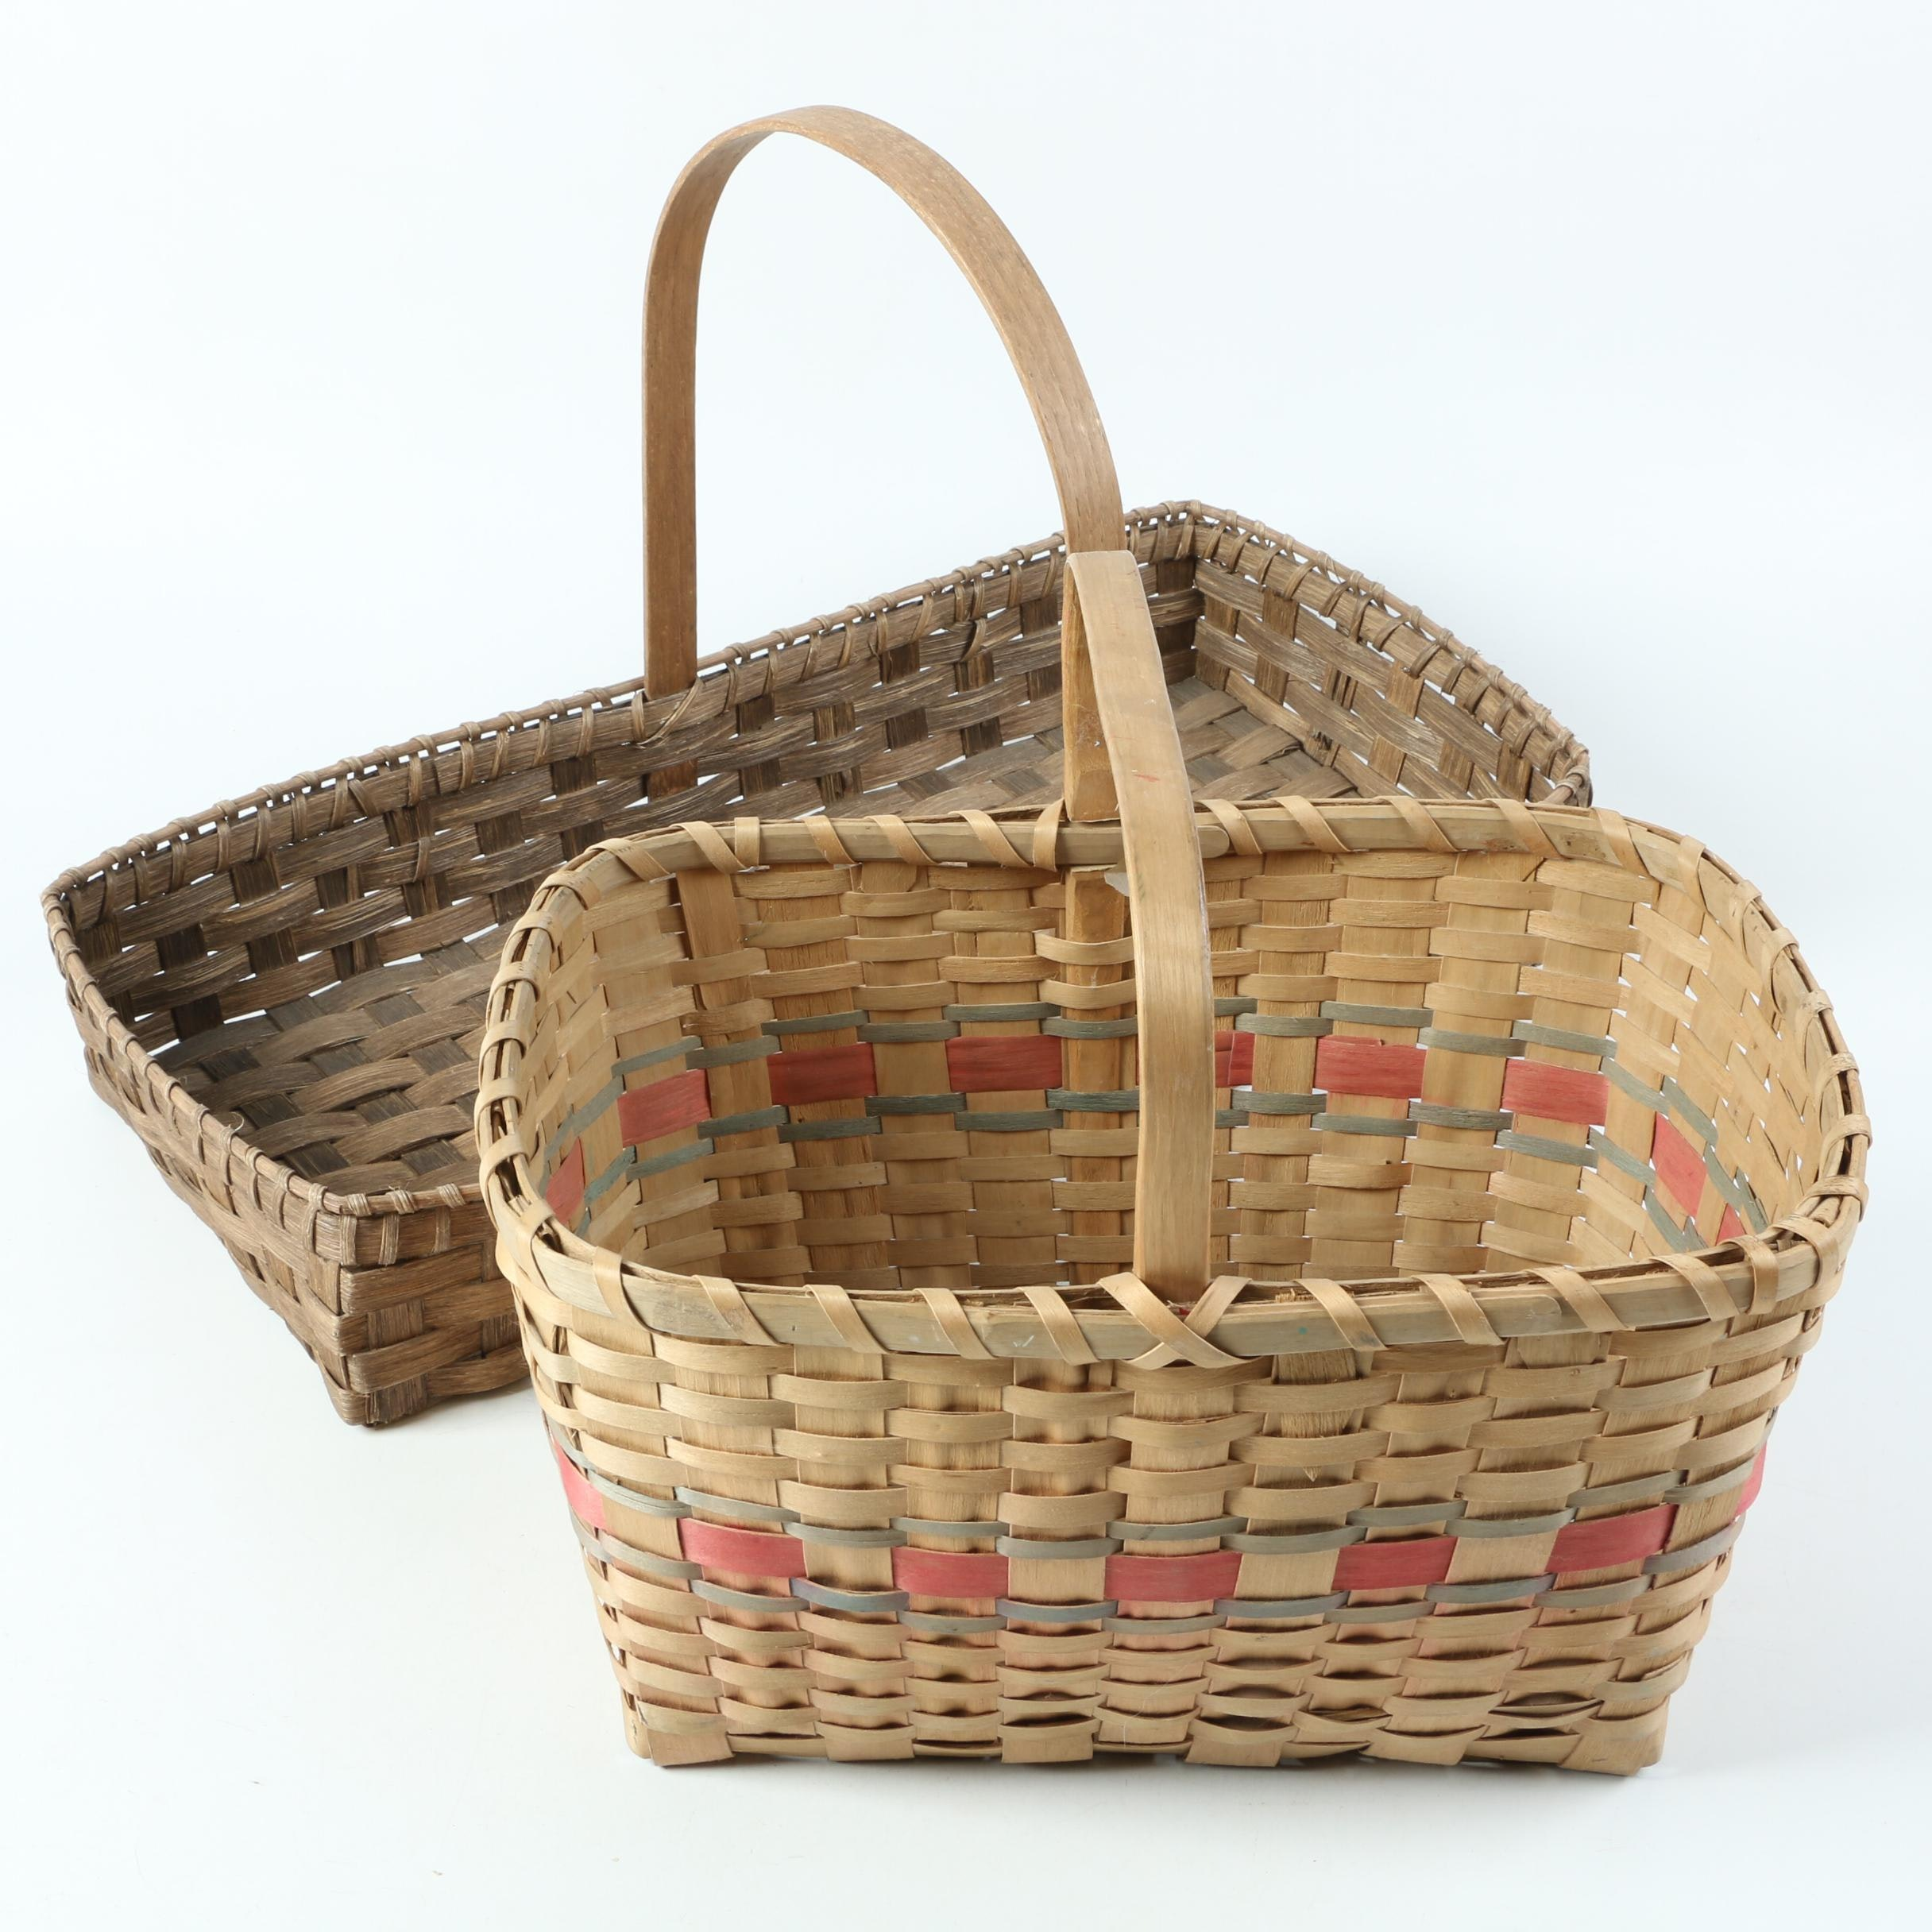 Vintage Hand Woven Splint Gathering Baskets Featuring Hala